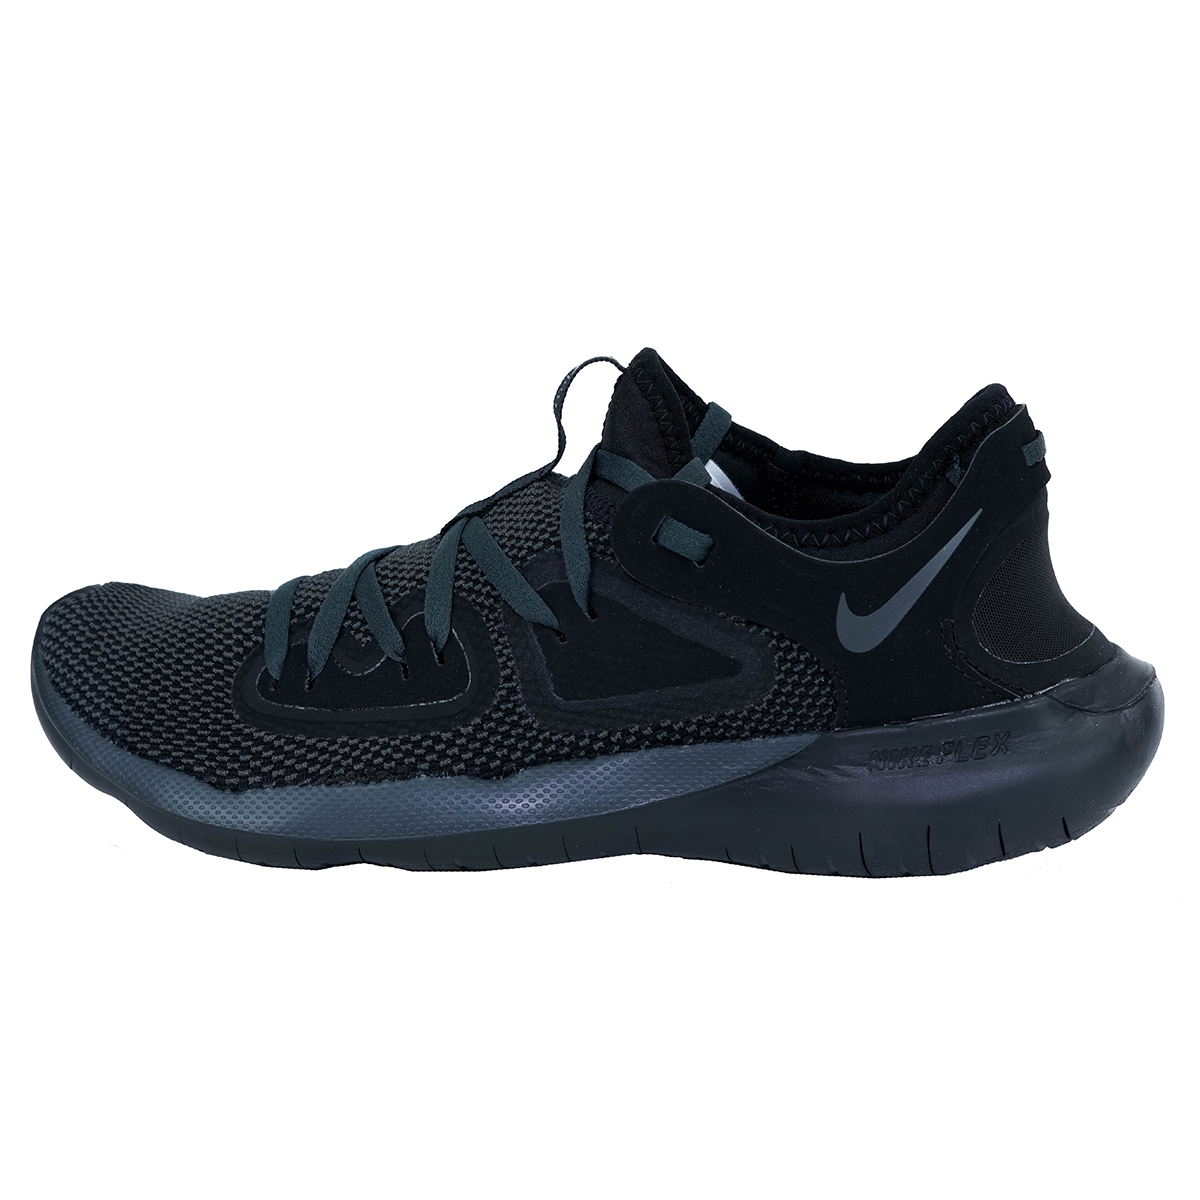 Nike-Men-039-s-Flex-RN-2019-Running-Shoes thumbnail 7